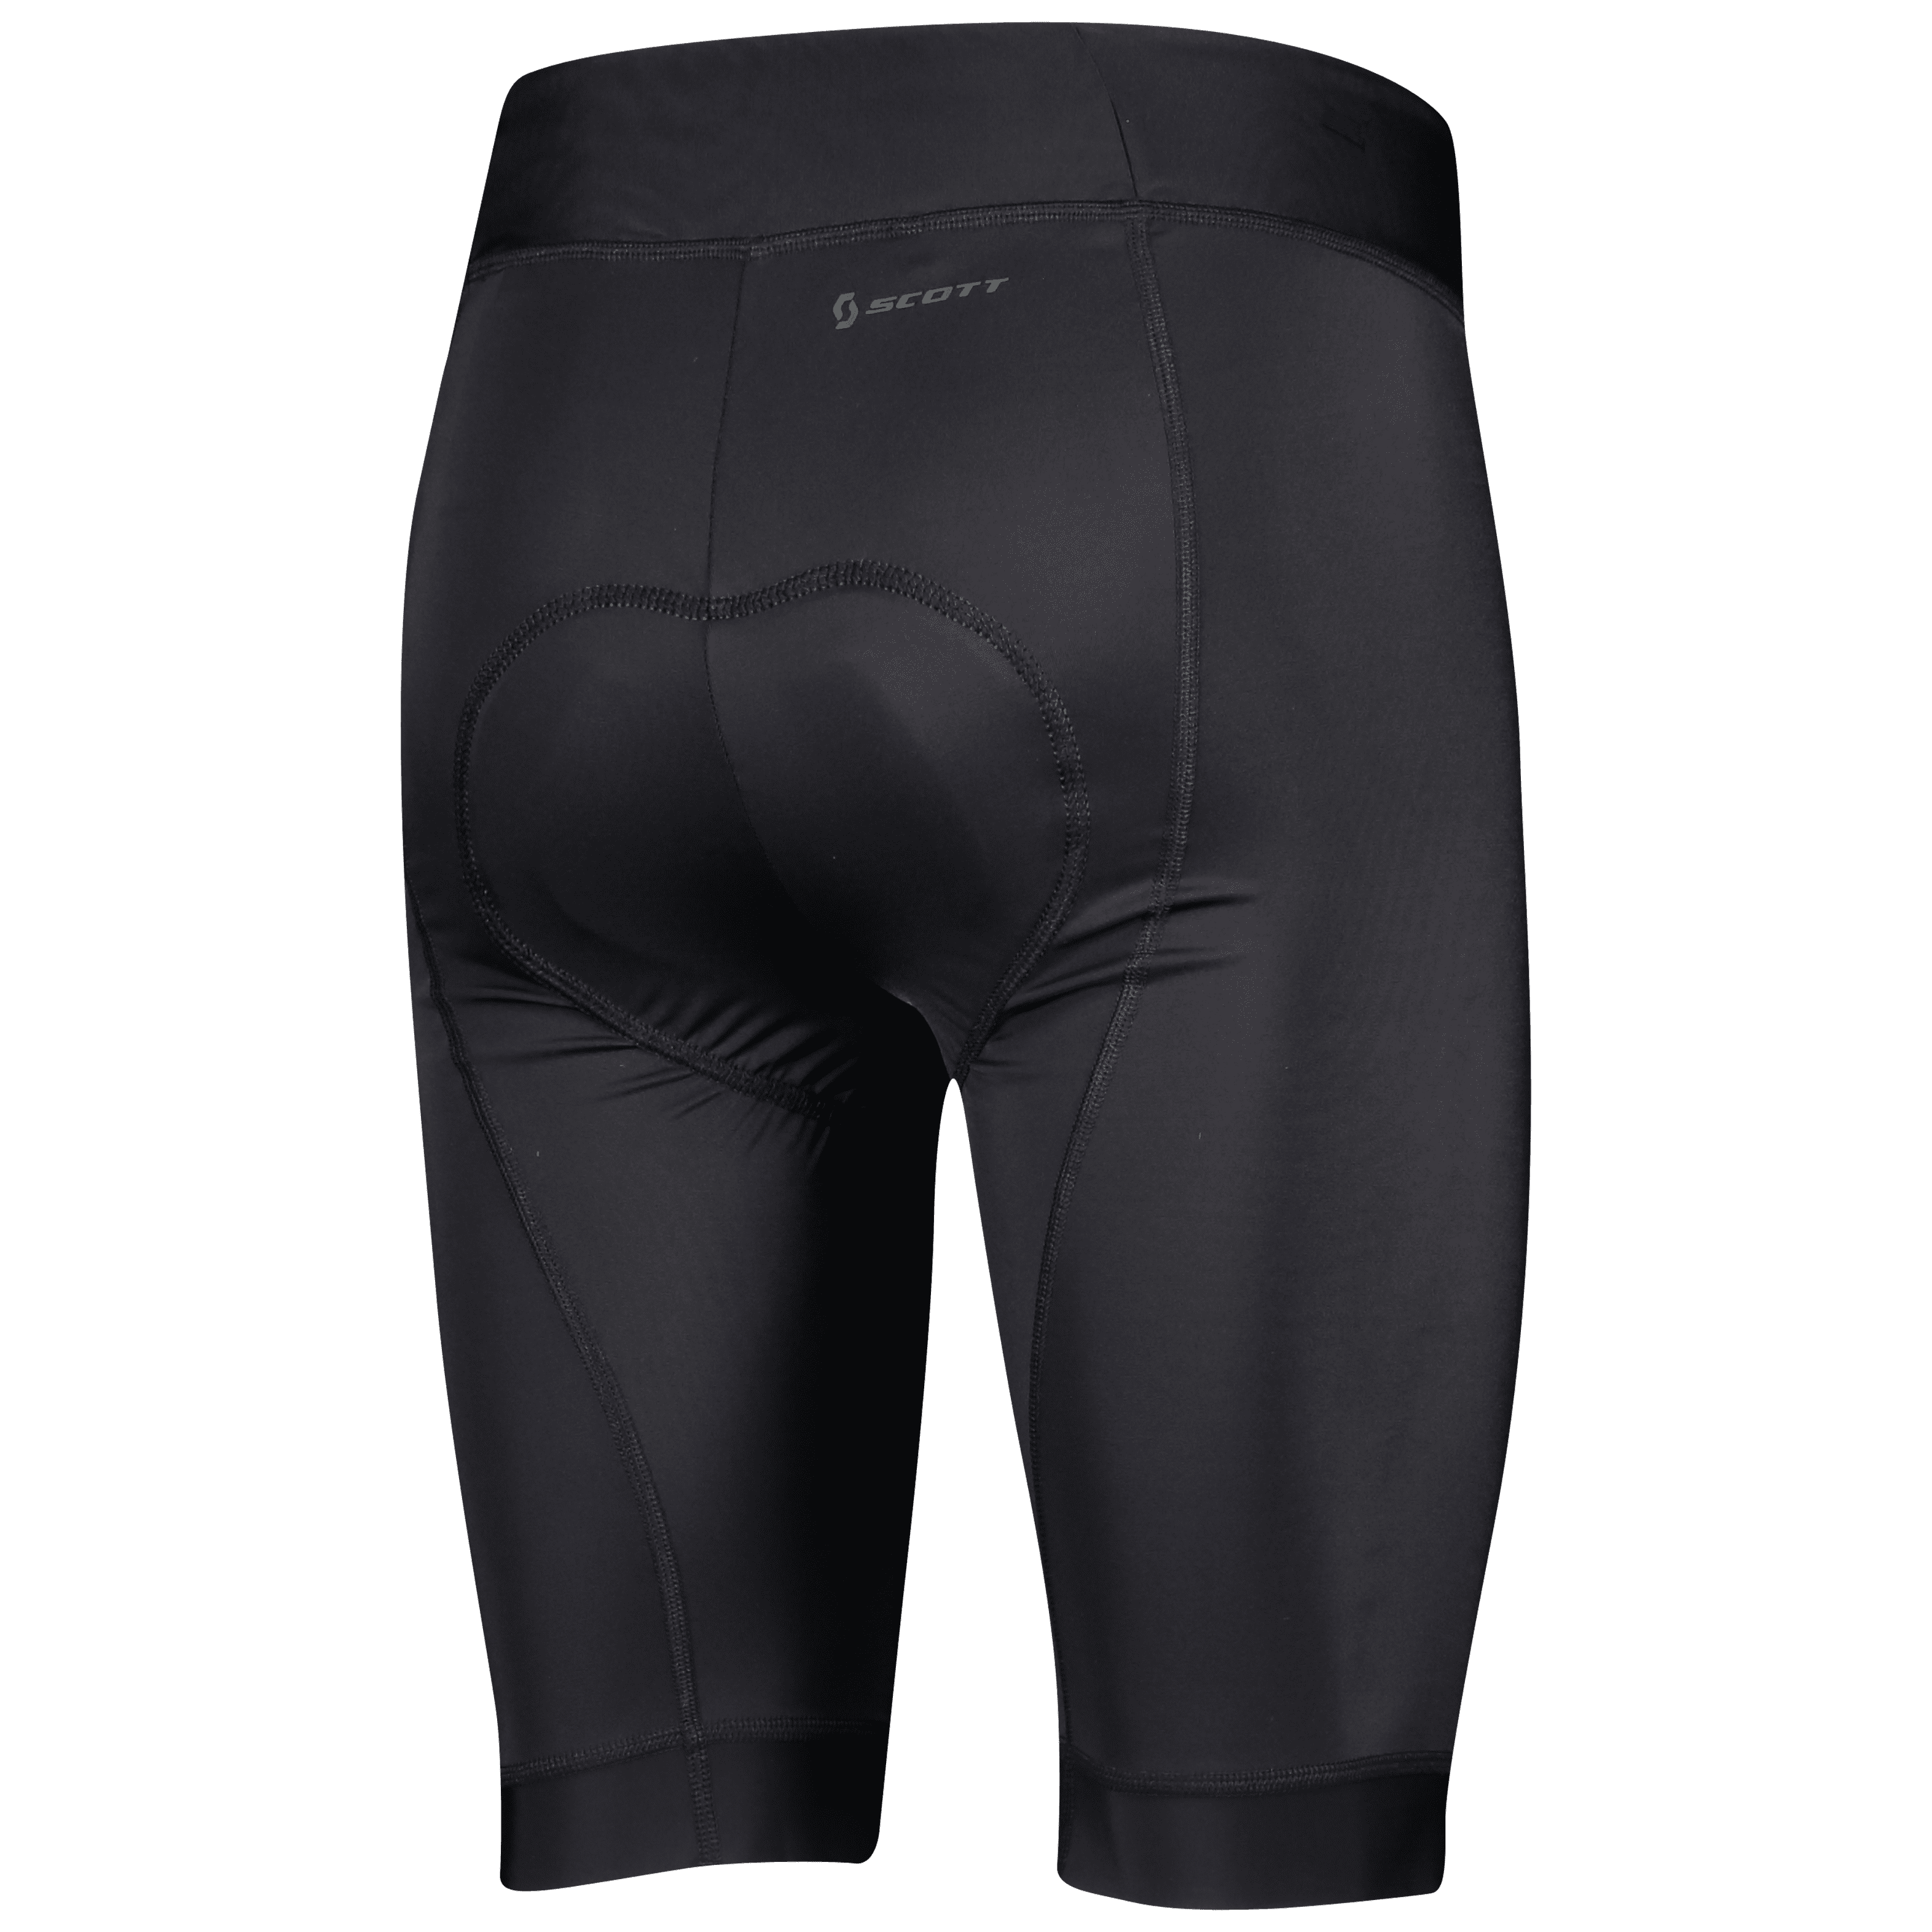 SCOTT Endurance + Men's Shorts